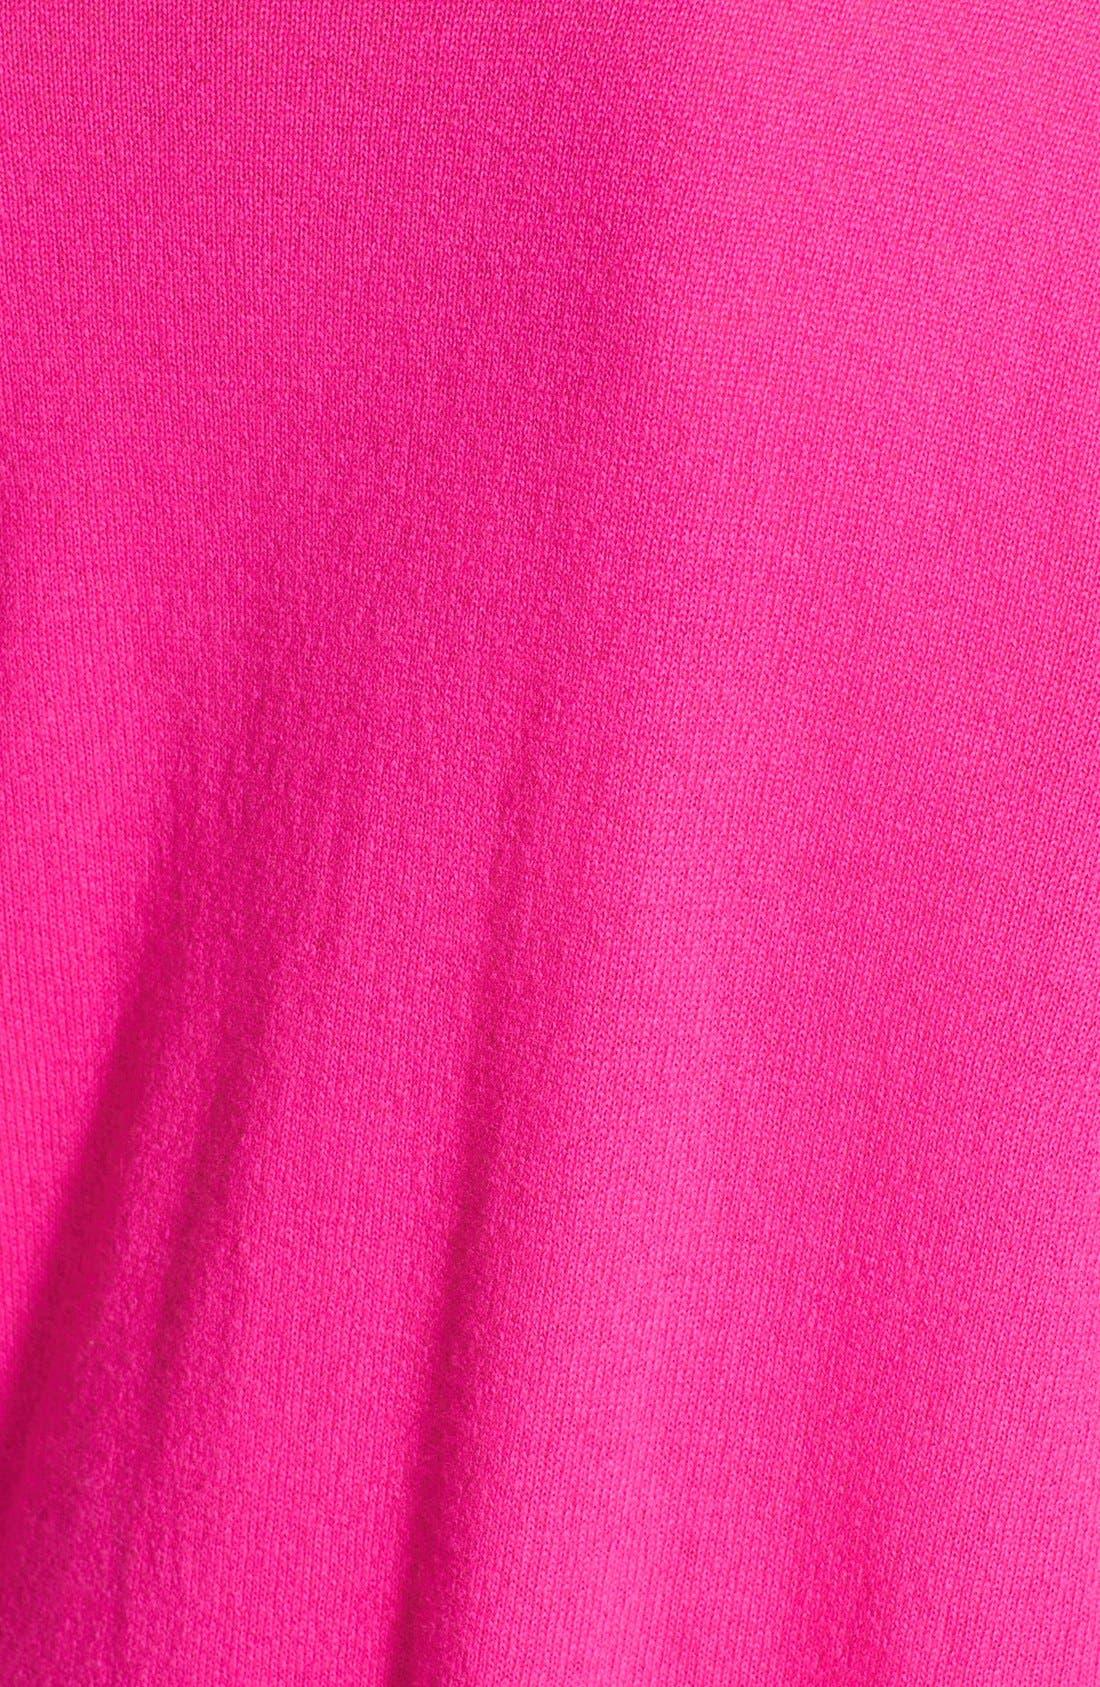 ColorblockCashmere Boyfriend Sweater,                             Alternate thumbnail 3, color,                             Pepper/ Pink Combo